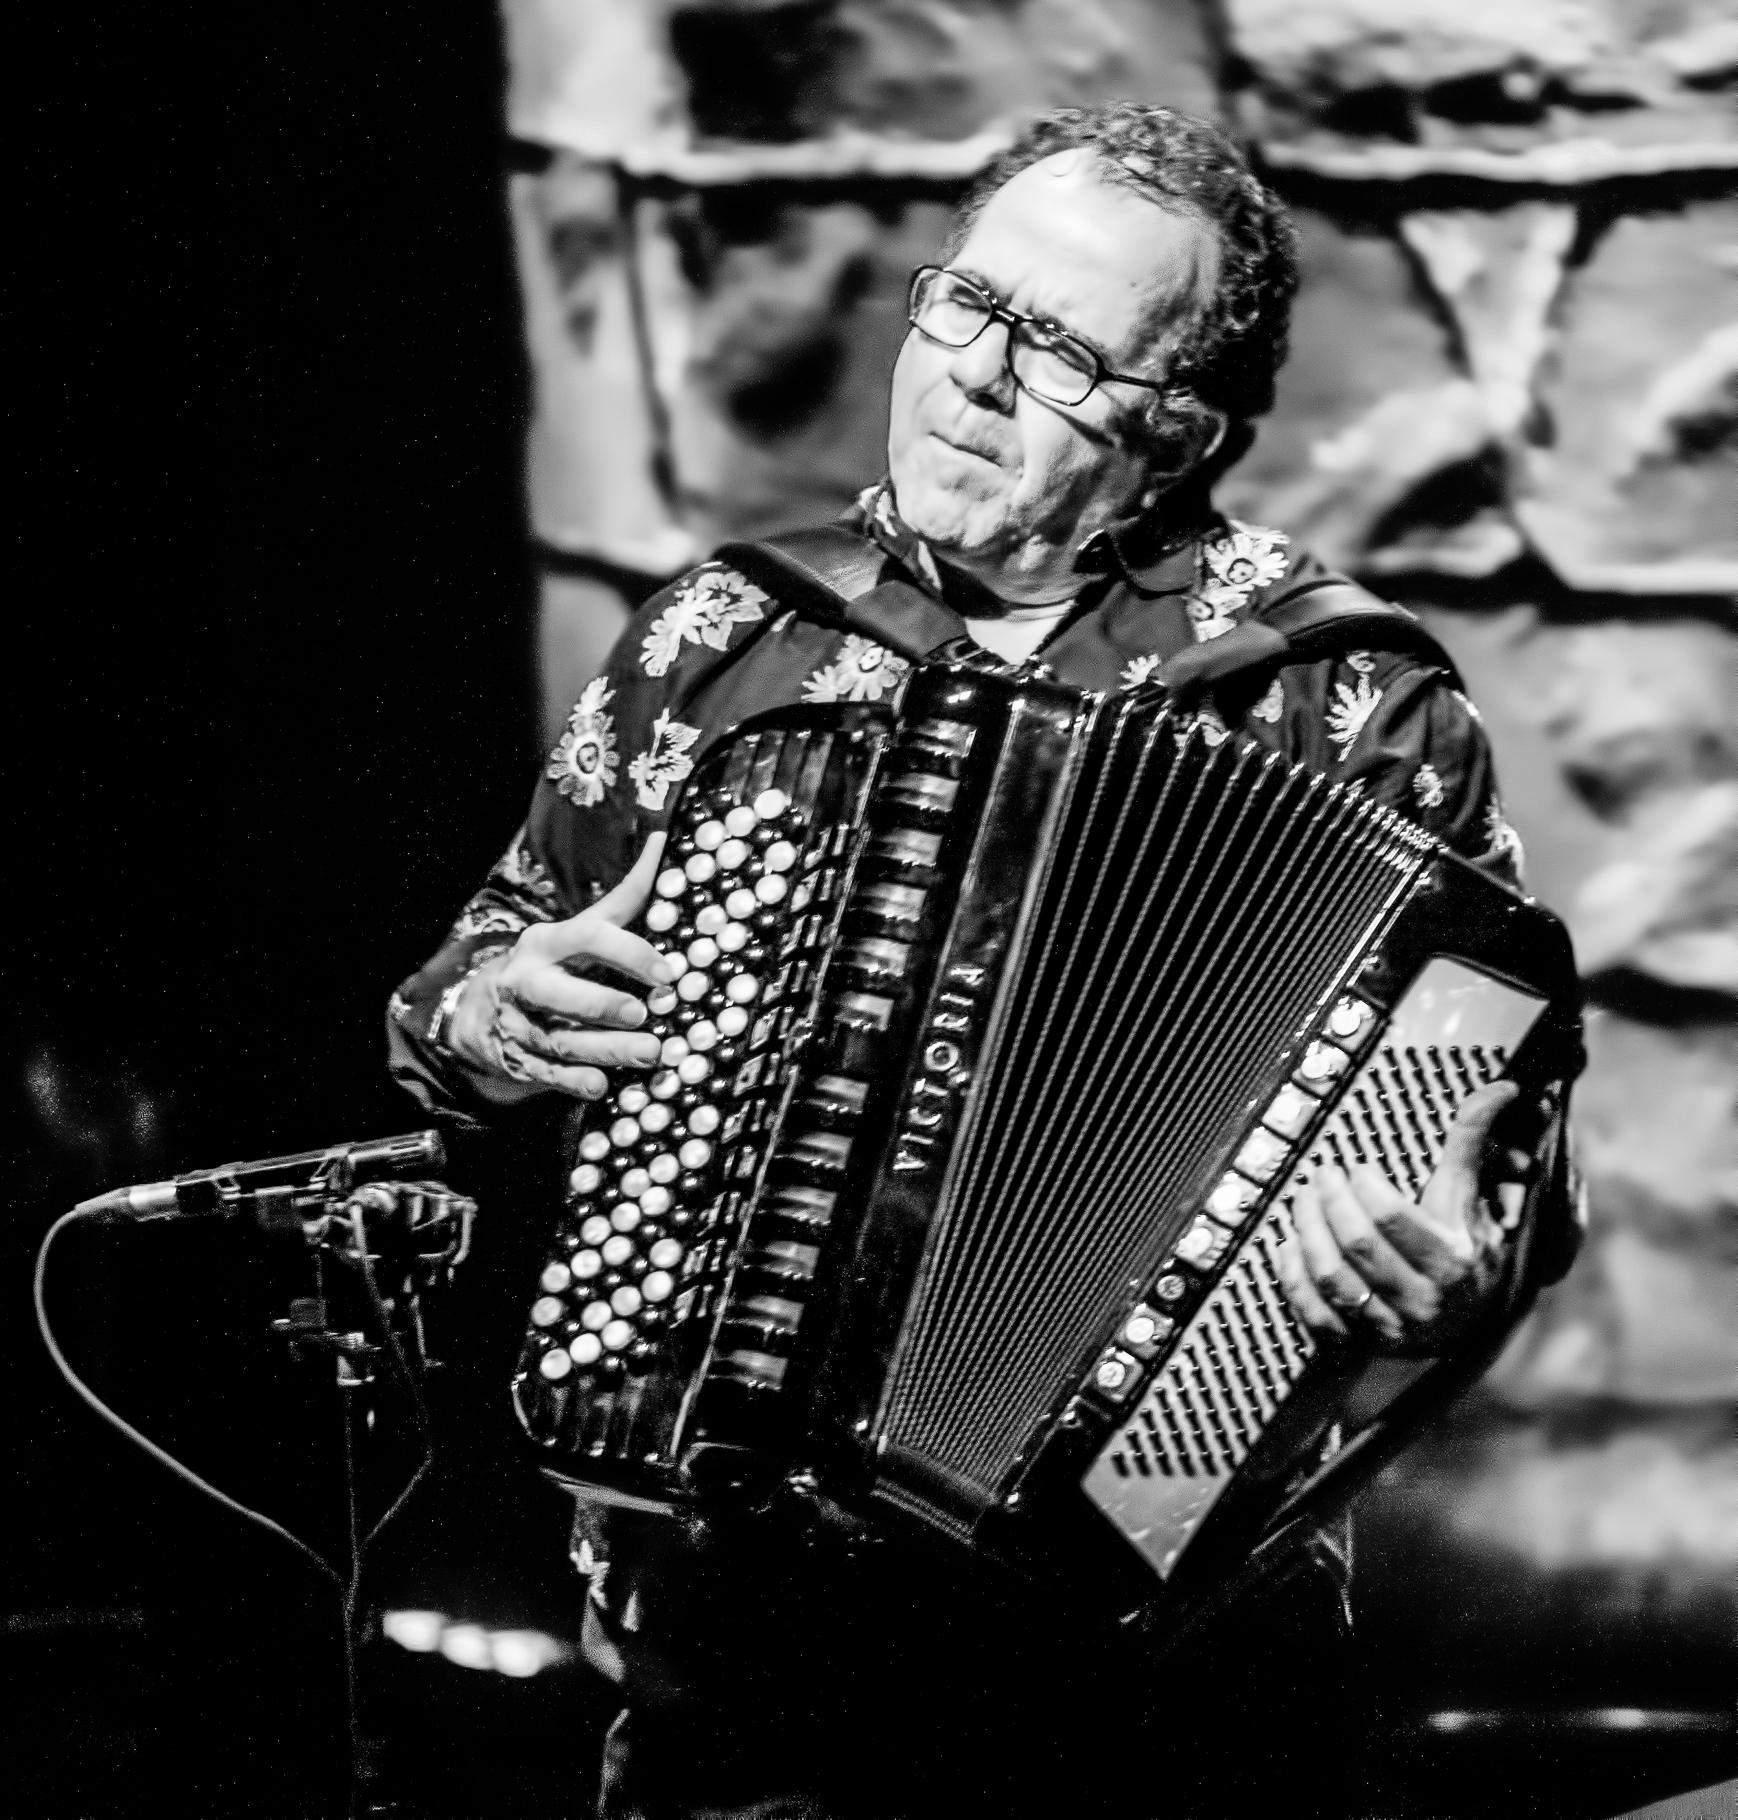 Richard Galliano at the Montreal International Jazz Festival 2015